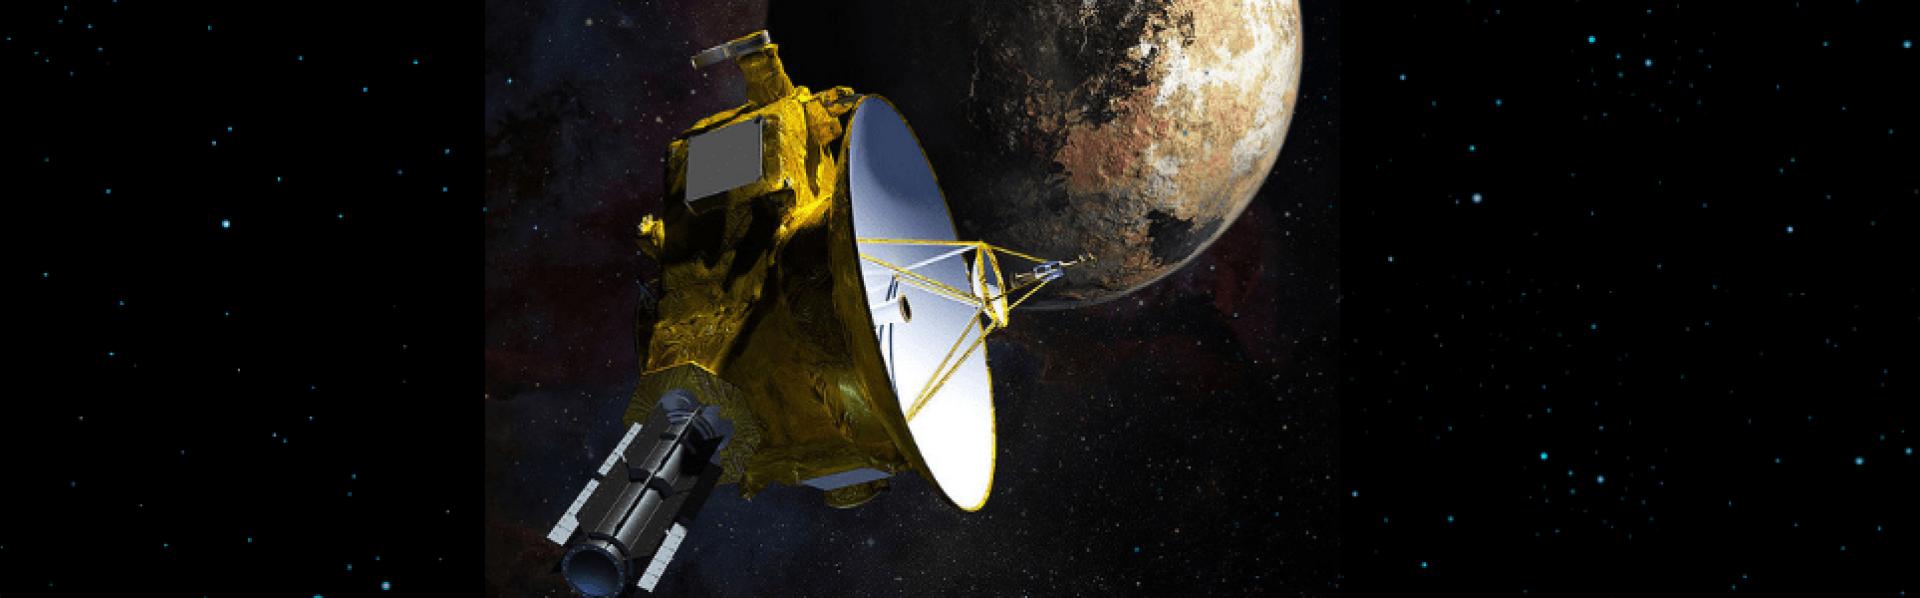 Plutón revelado: la misión New Horizons